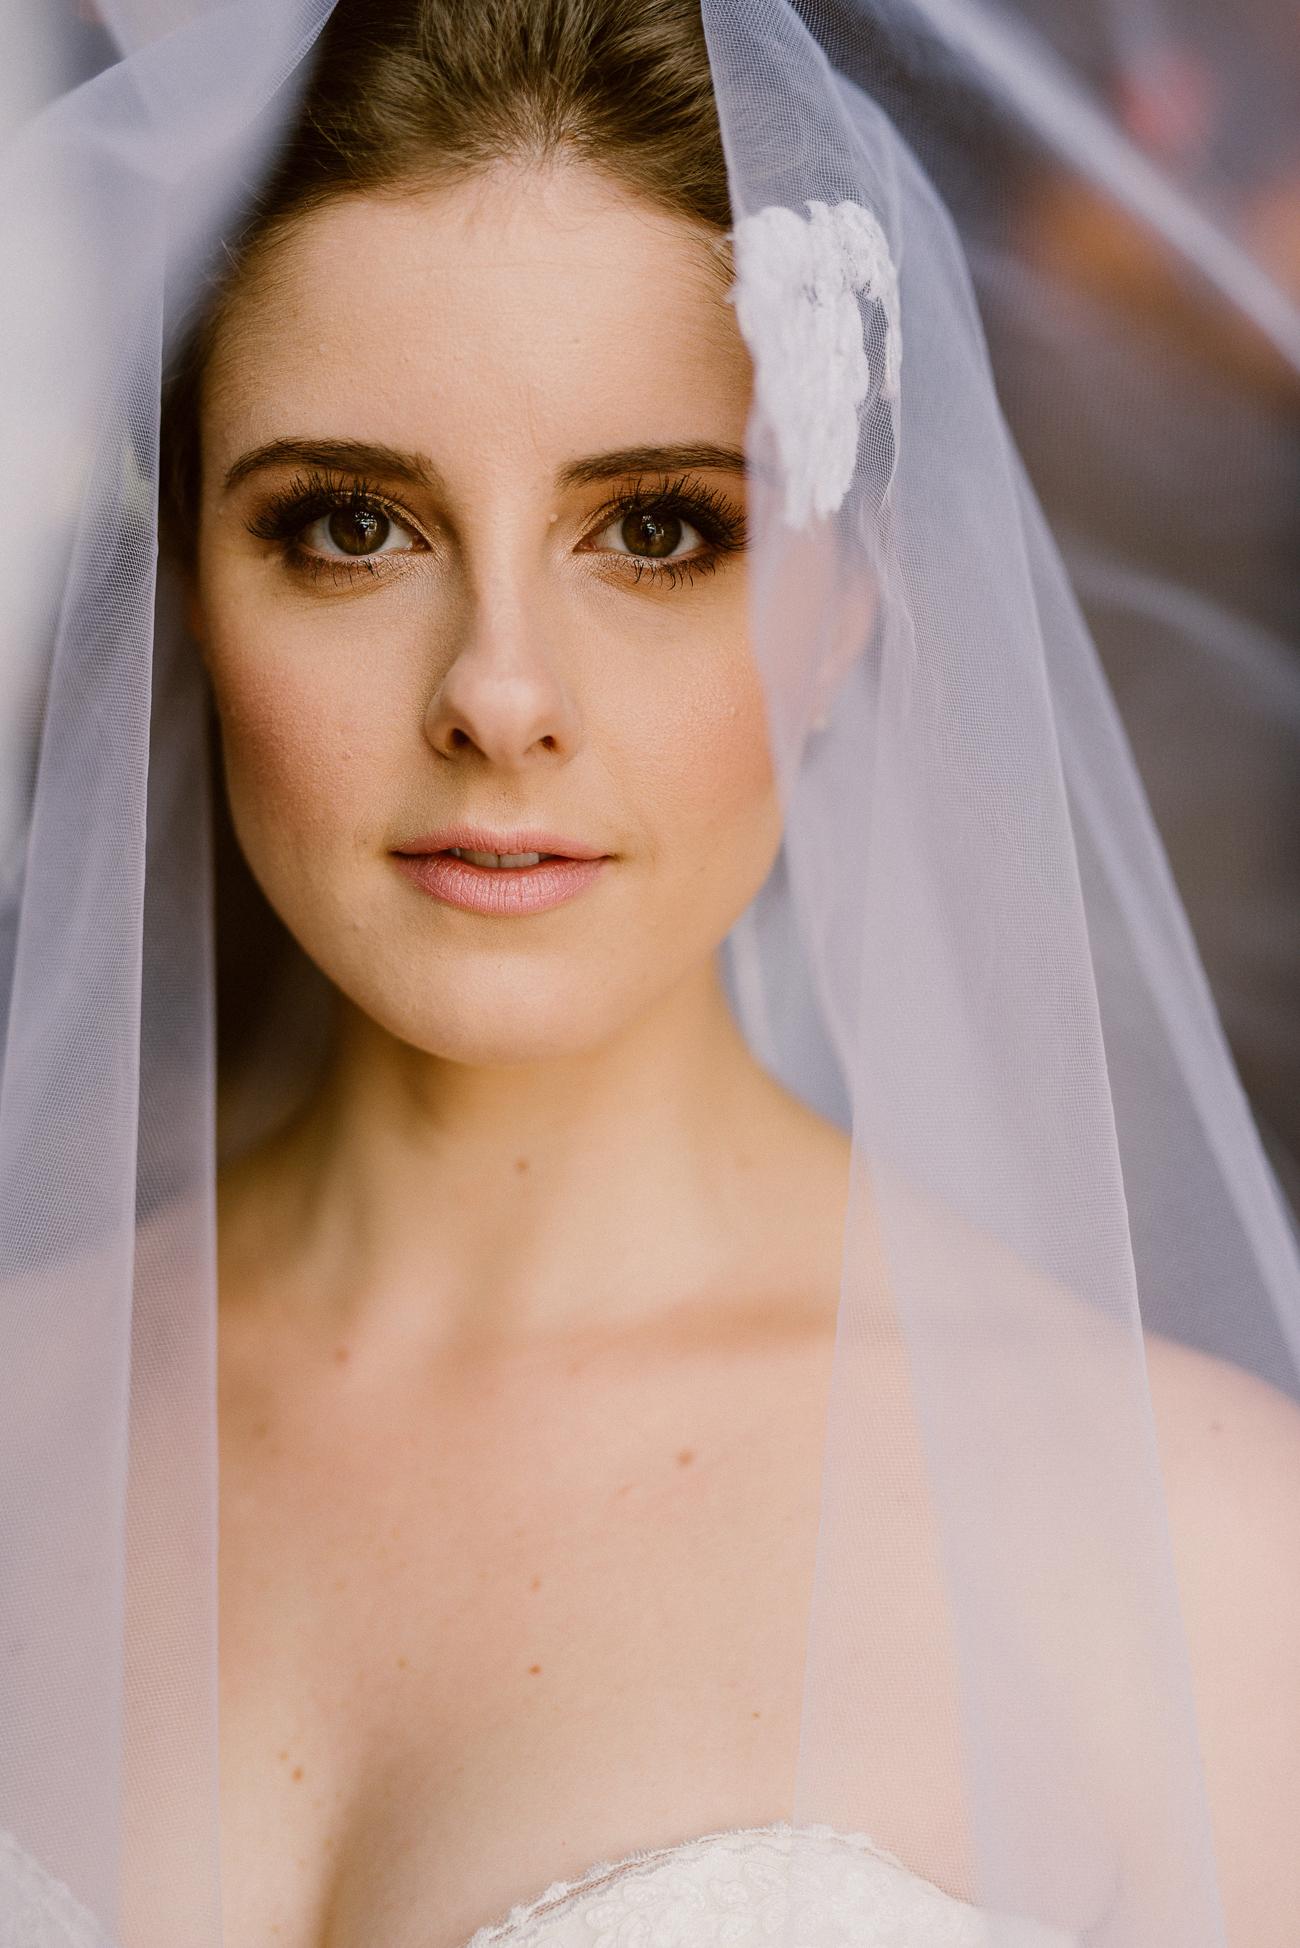 Heirloom Wedding Veil | Image: Lad & Lass Photography